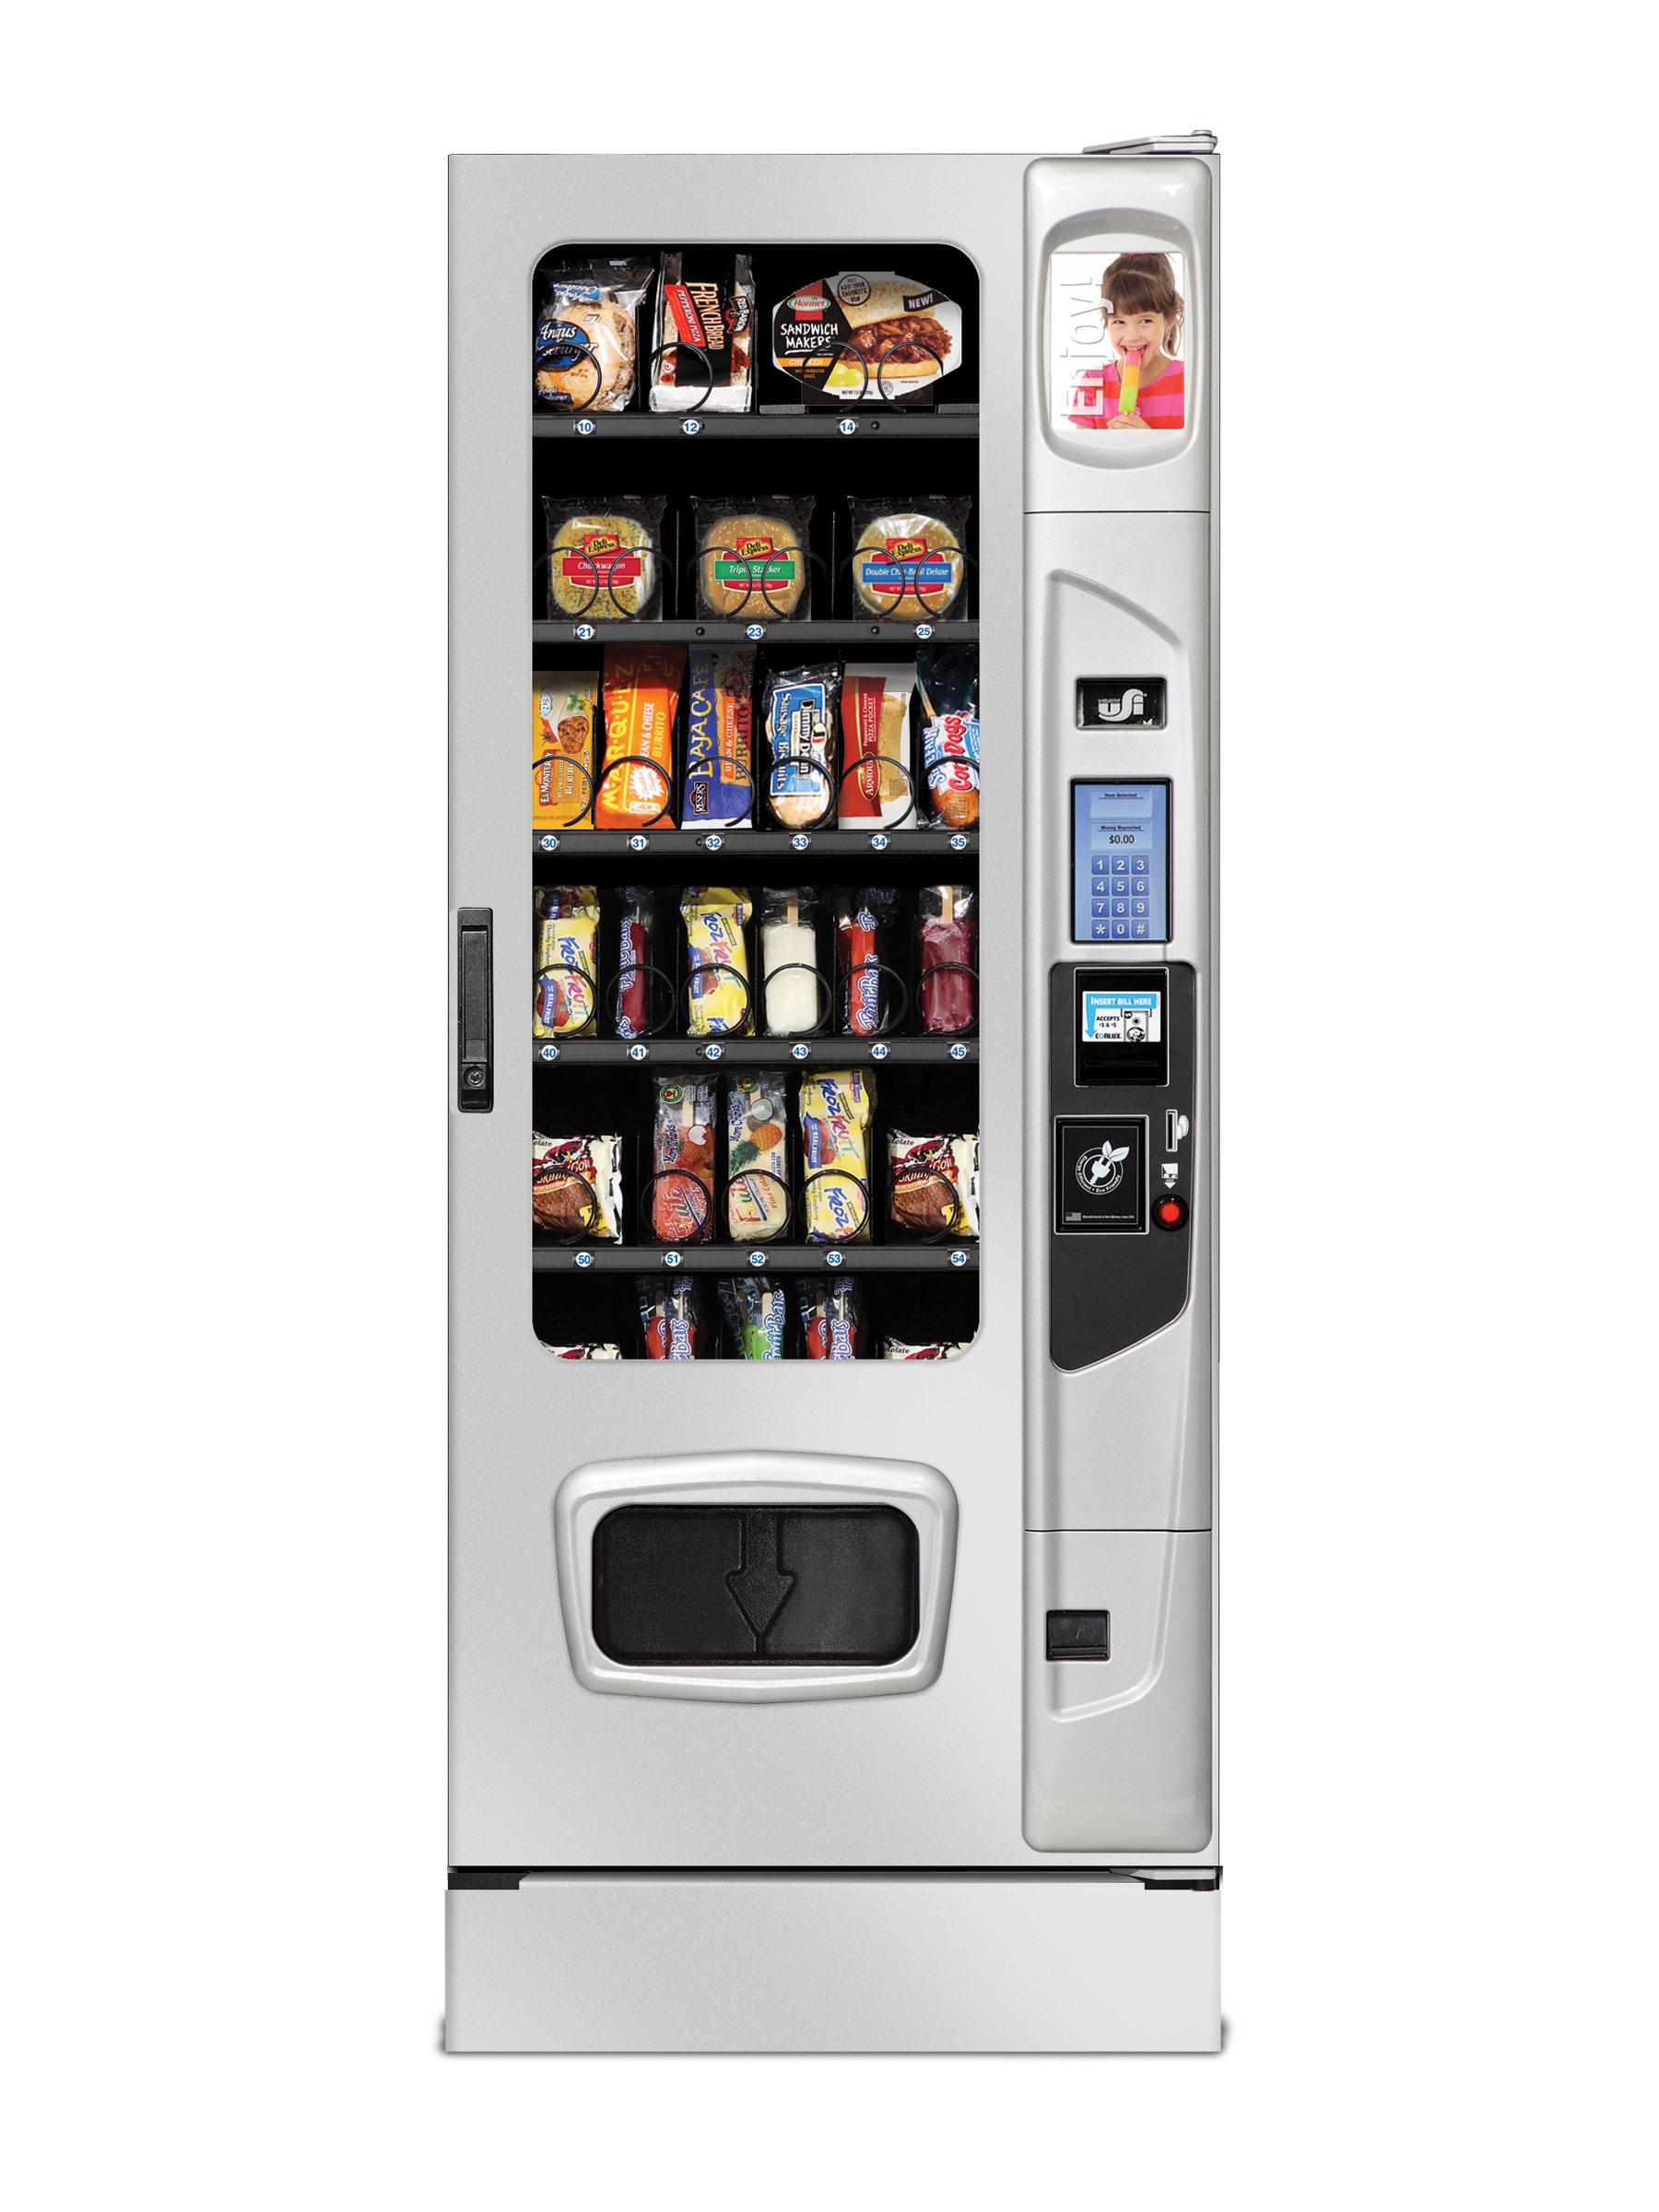 Usi Combi 3000 Southeastern Vending Services